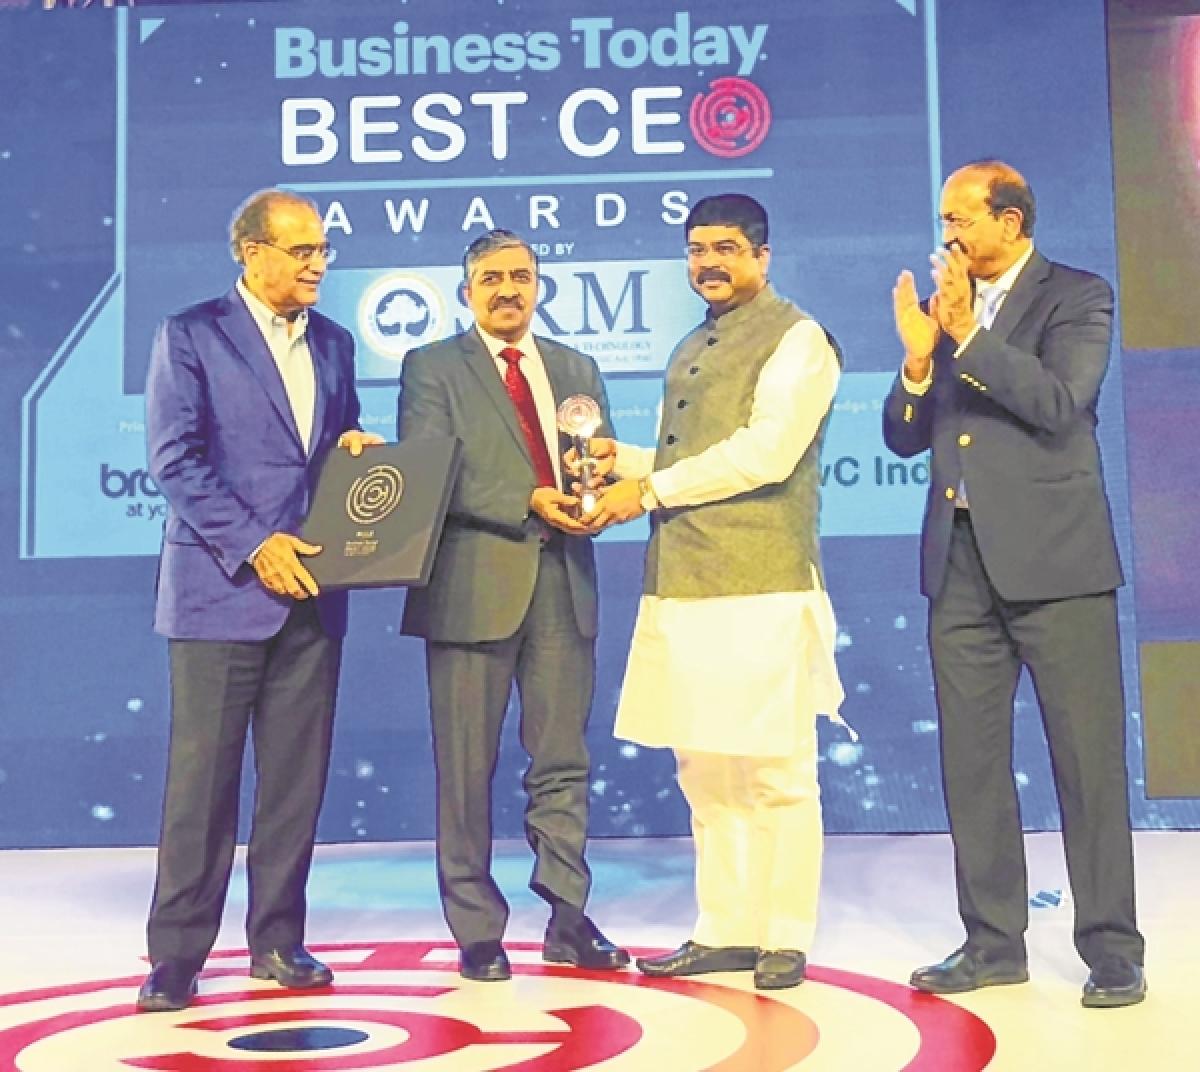 BC Tripathi, former GAIL CMD, receives 'Best CEO' Award